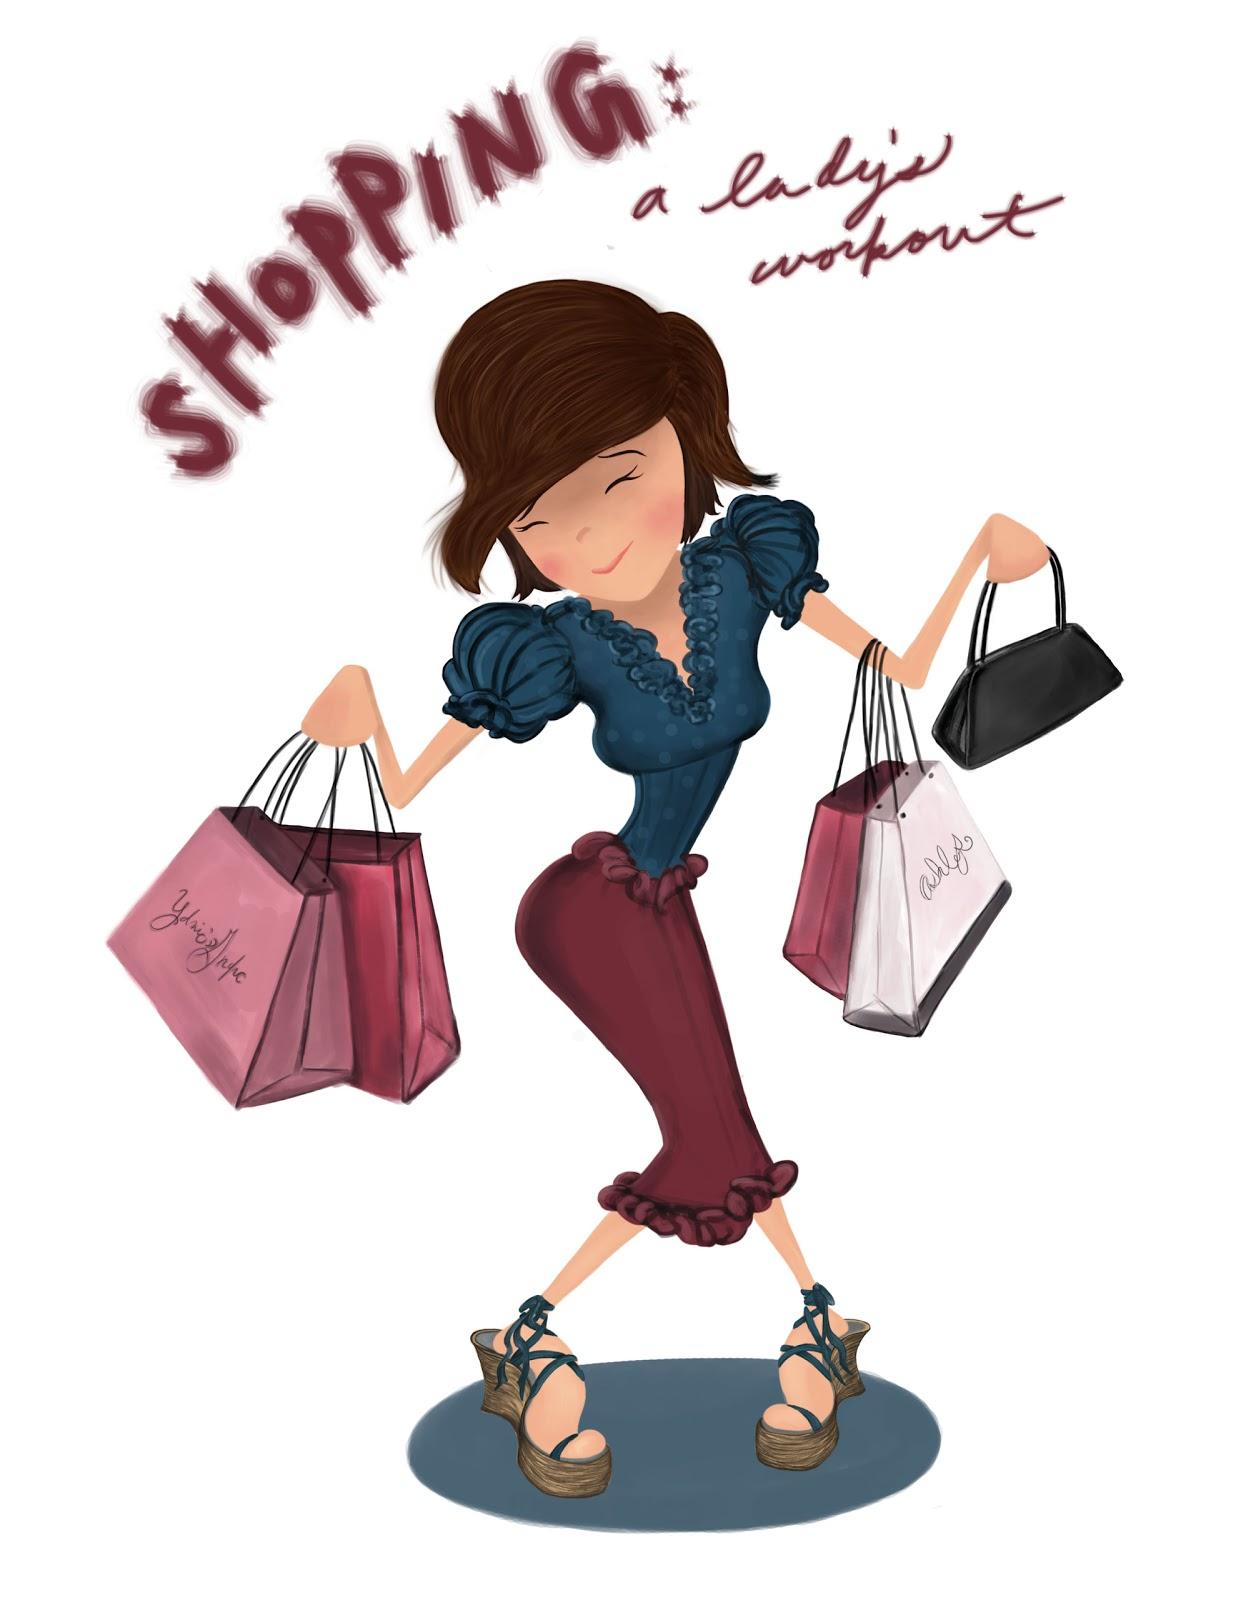 http://1.bp.blogspot.com/-2dzd_LFt-Jw/TaNq3eWkheI/AAAAAAAAAE0/QHZB5RyidYU/s1600/shopping1.jpg